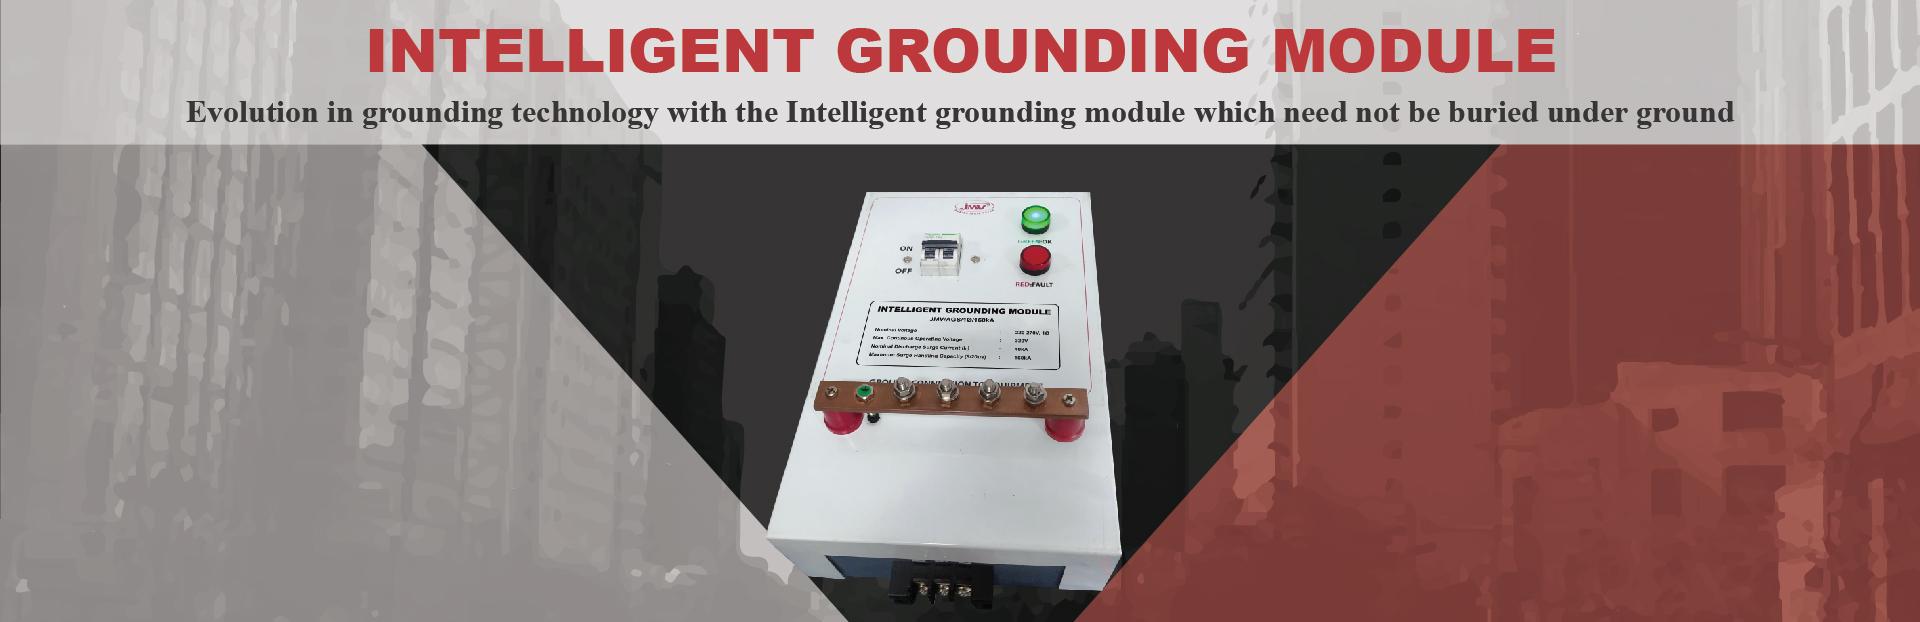 JMV - intelligent grounding module